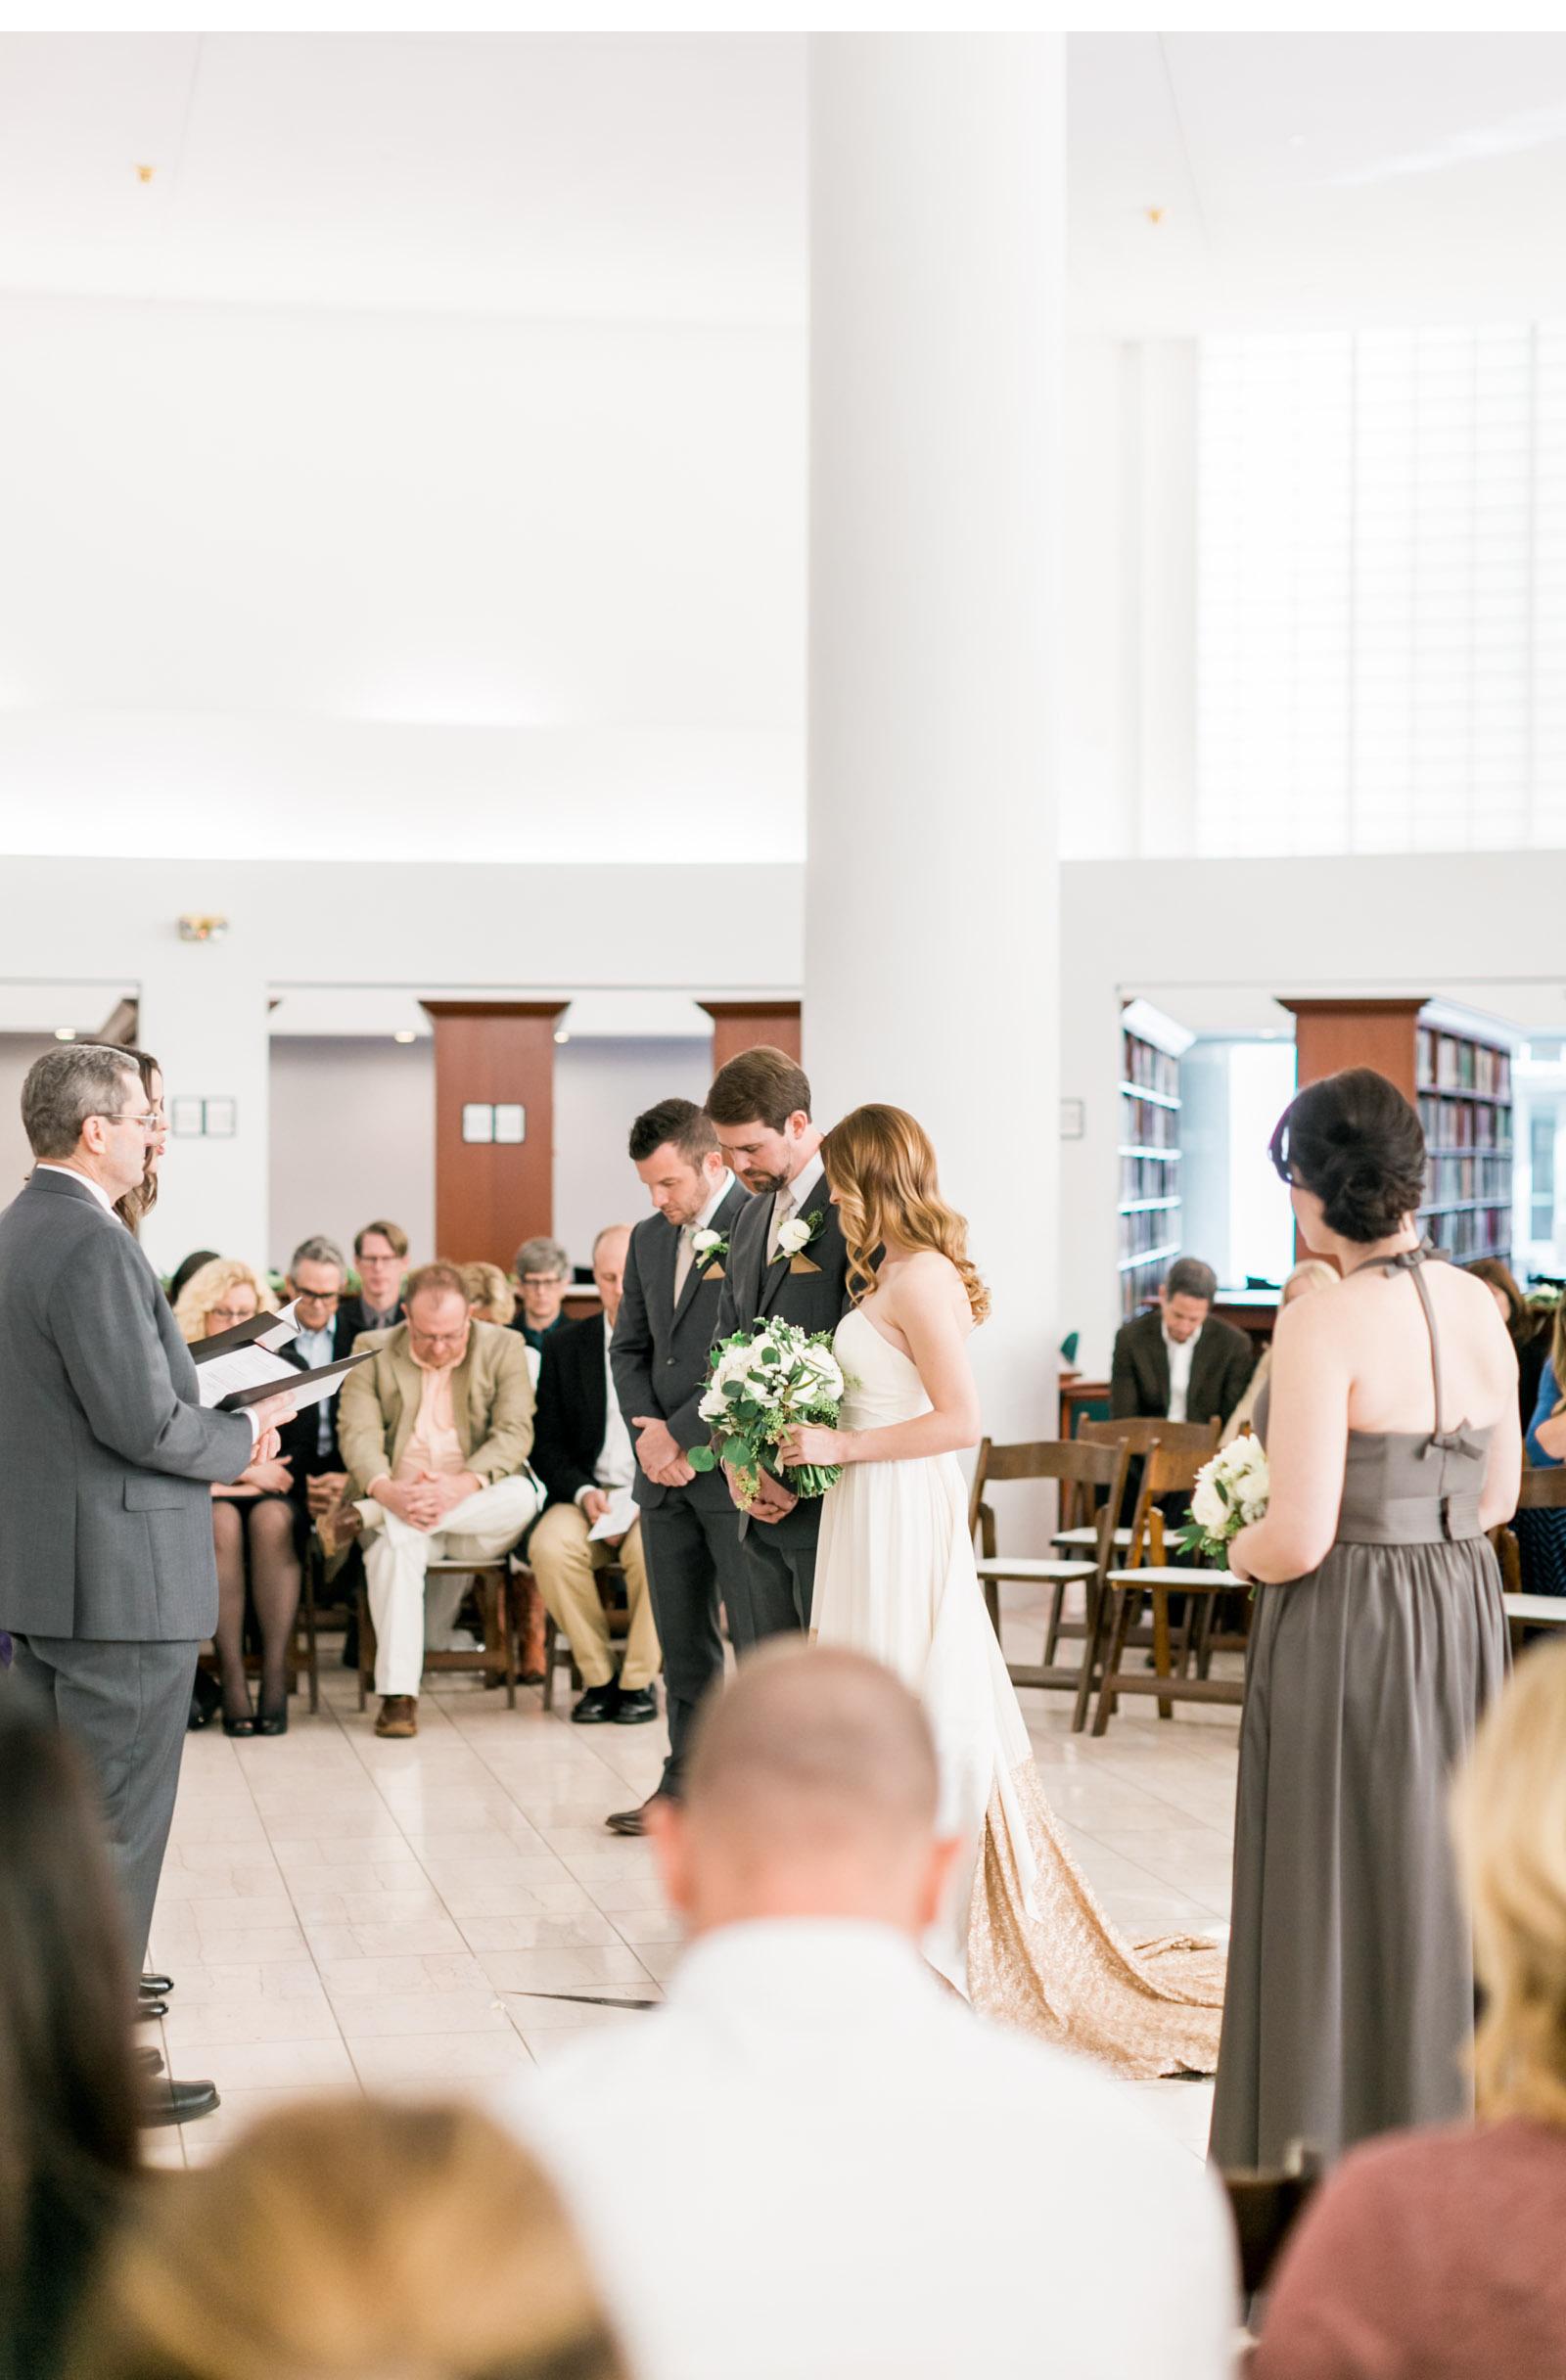 Darling-Library-Wedding_03.jpg